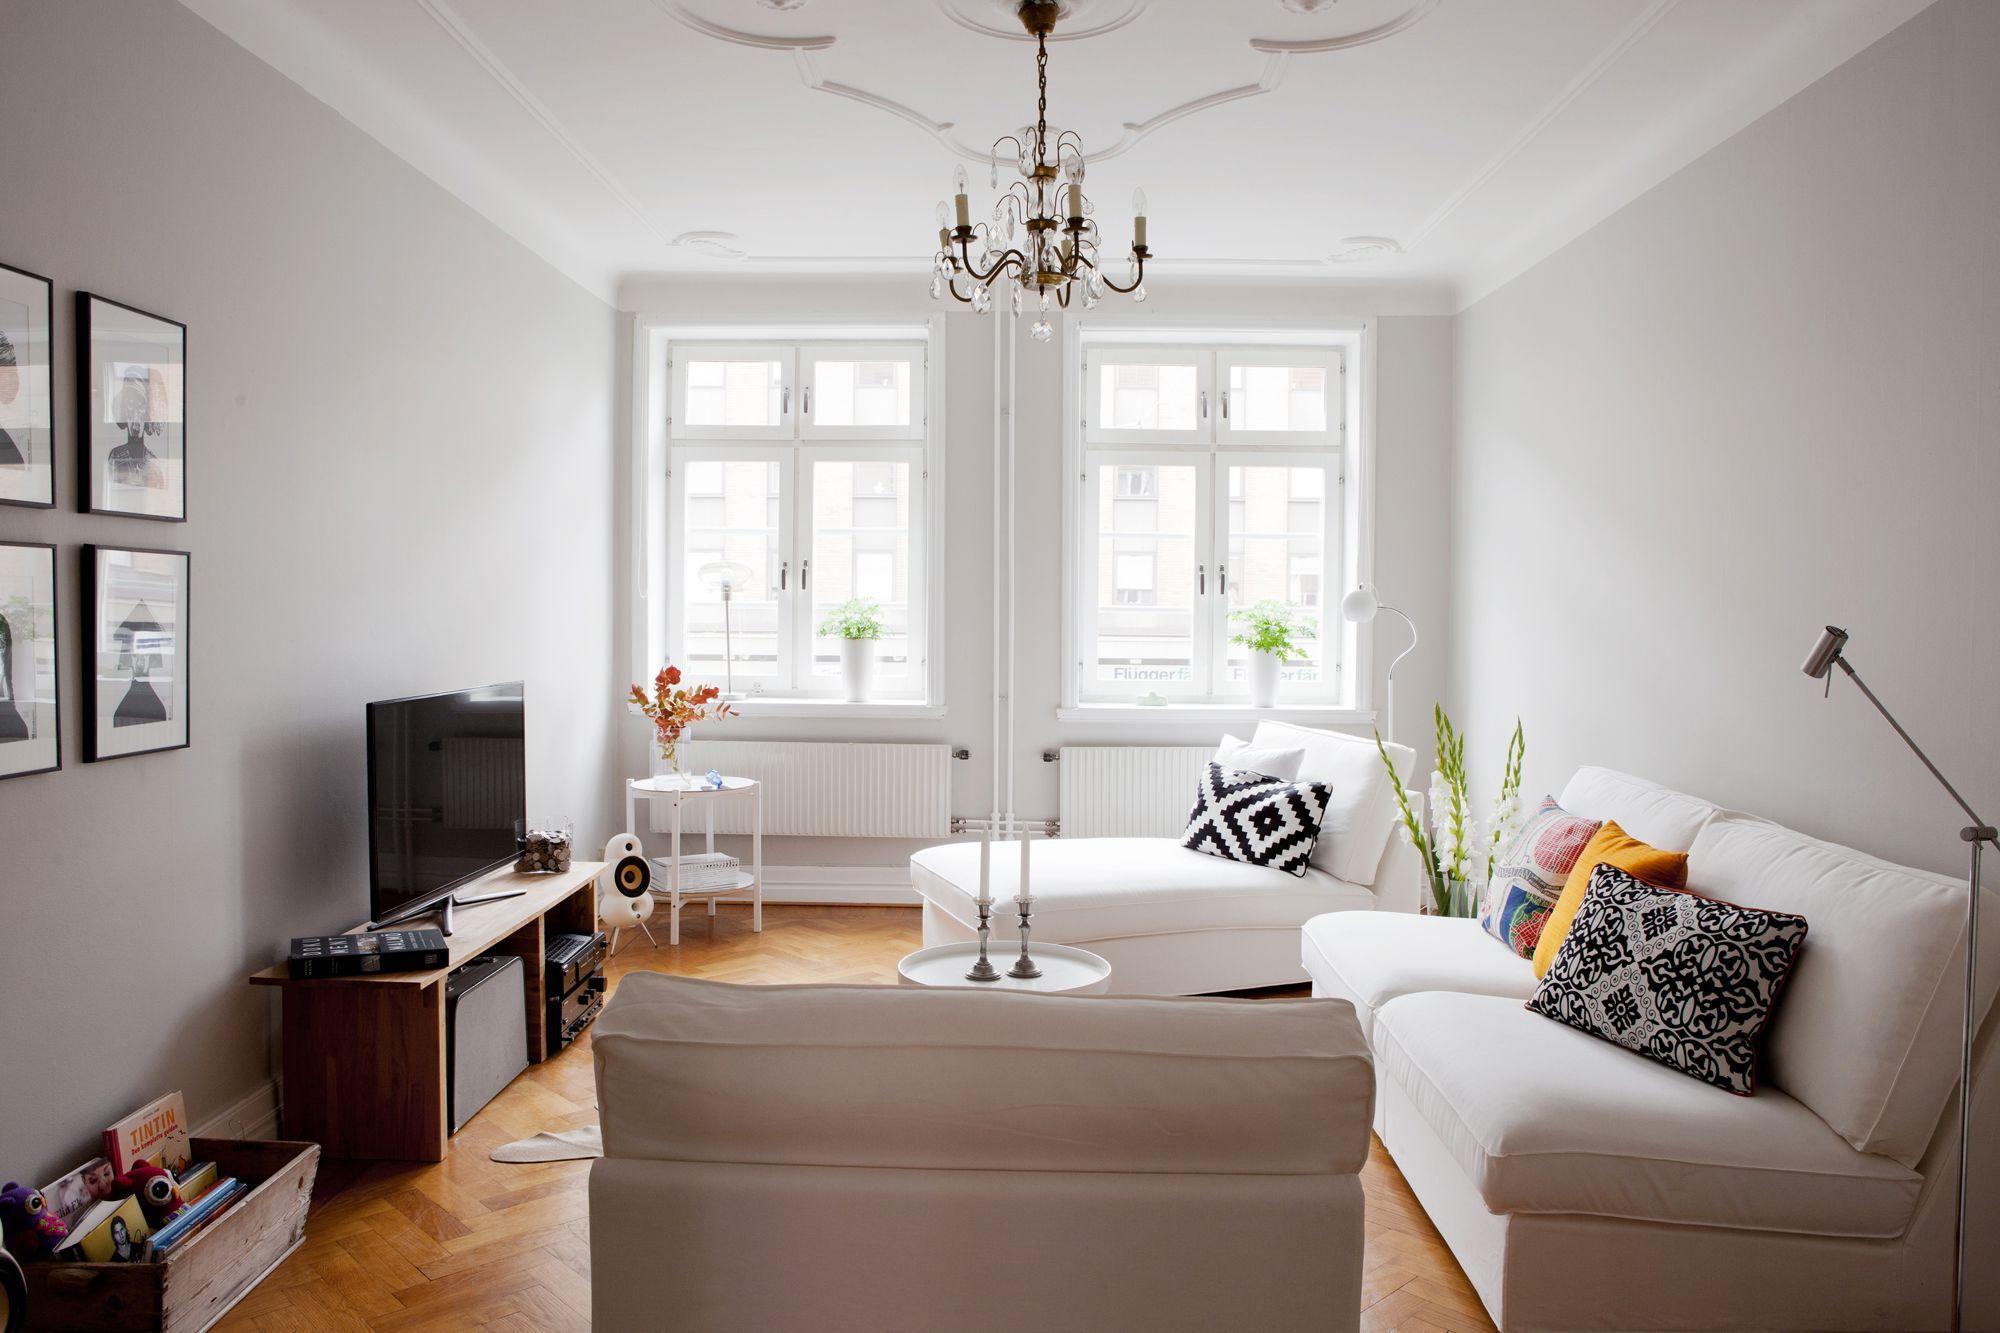 Paredes Grises Muebles Blancos Suelo De Madera Paredes Grises  ~ Decorar Apartamento Pequeño Ikea